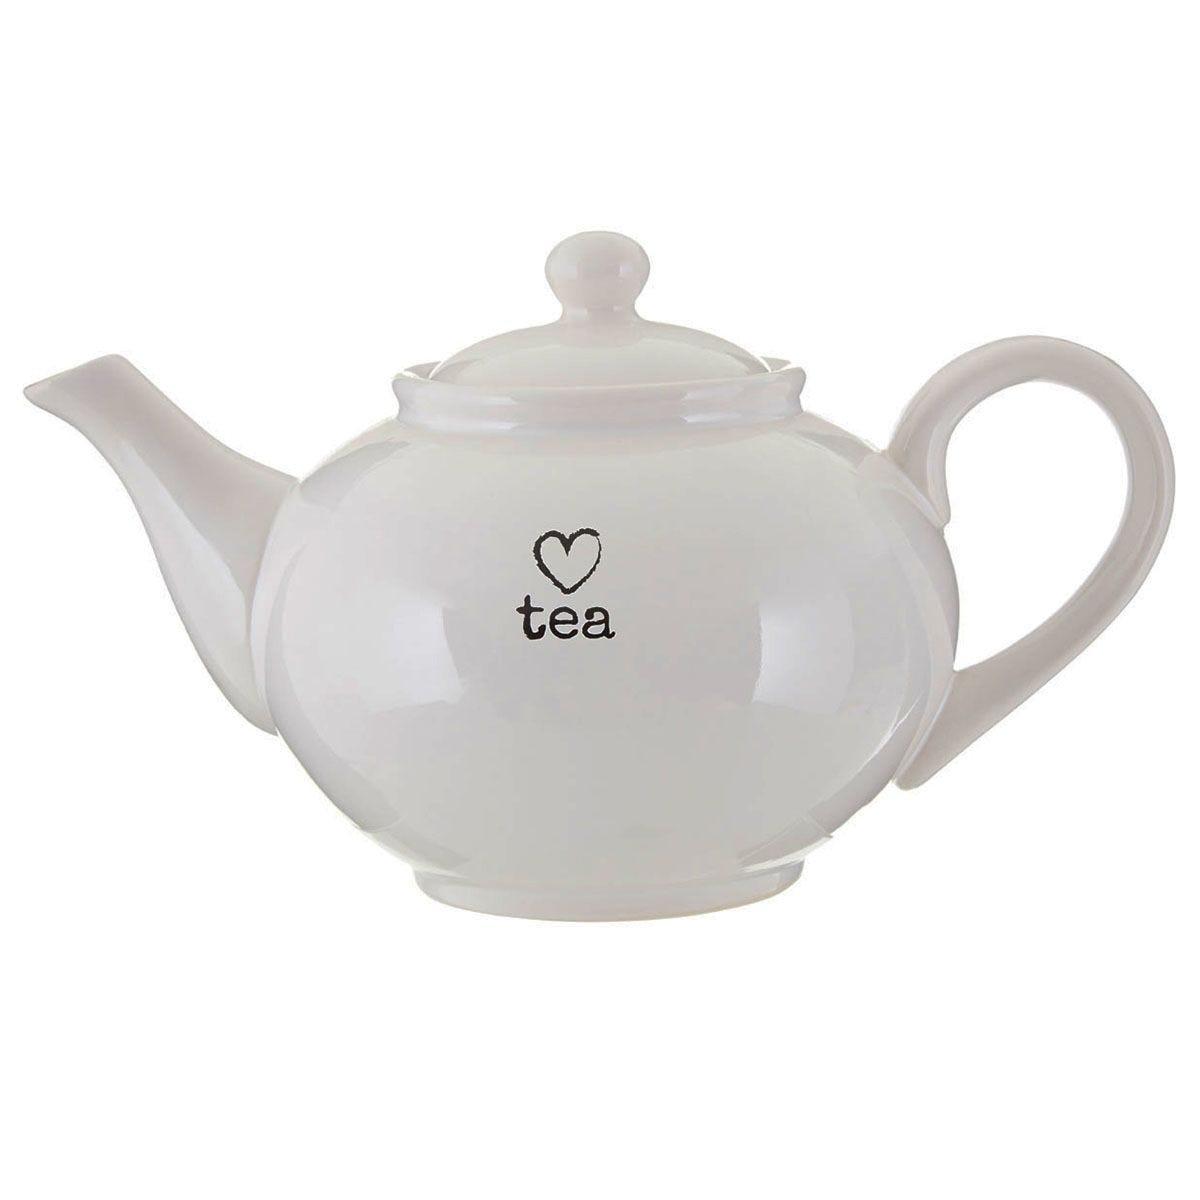 Premier Housewares Charm Teapot - White